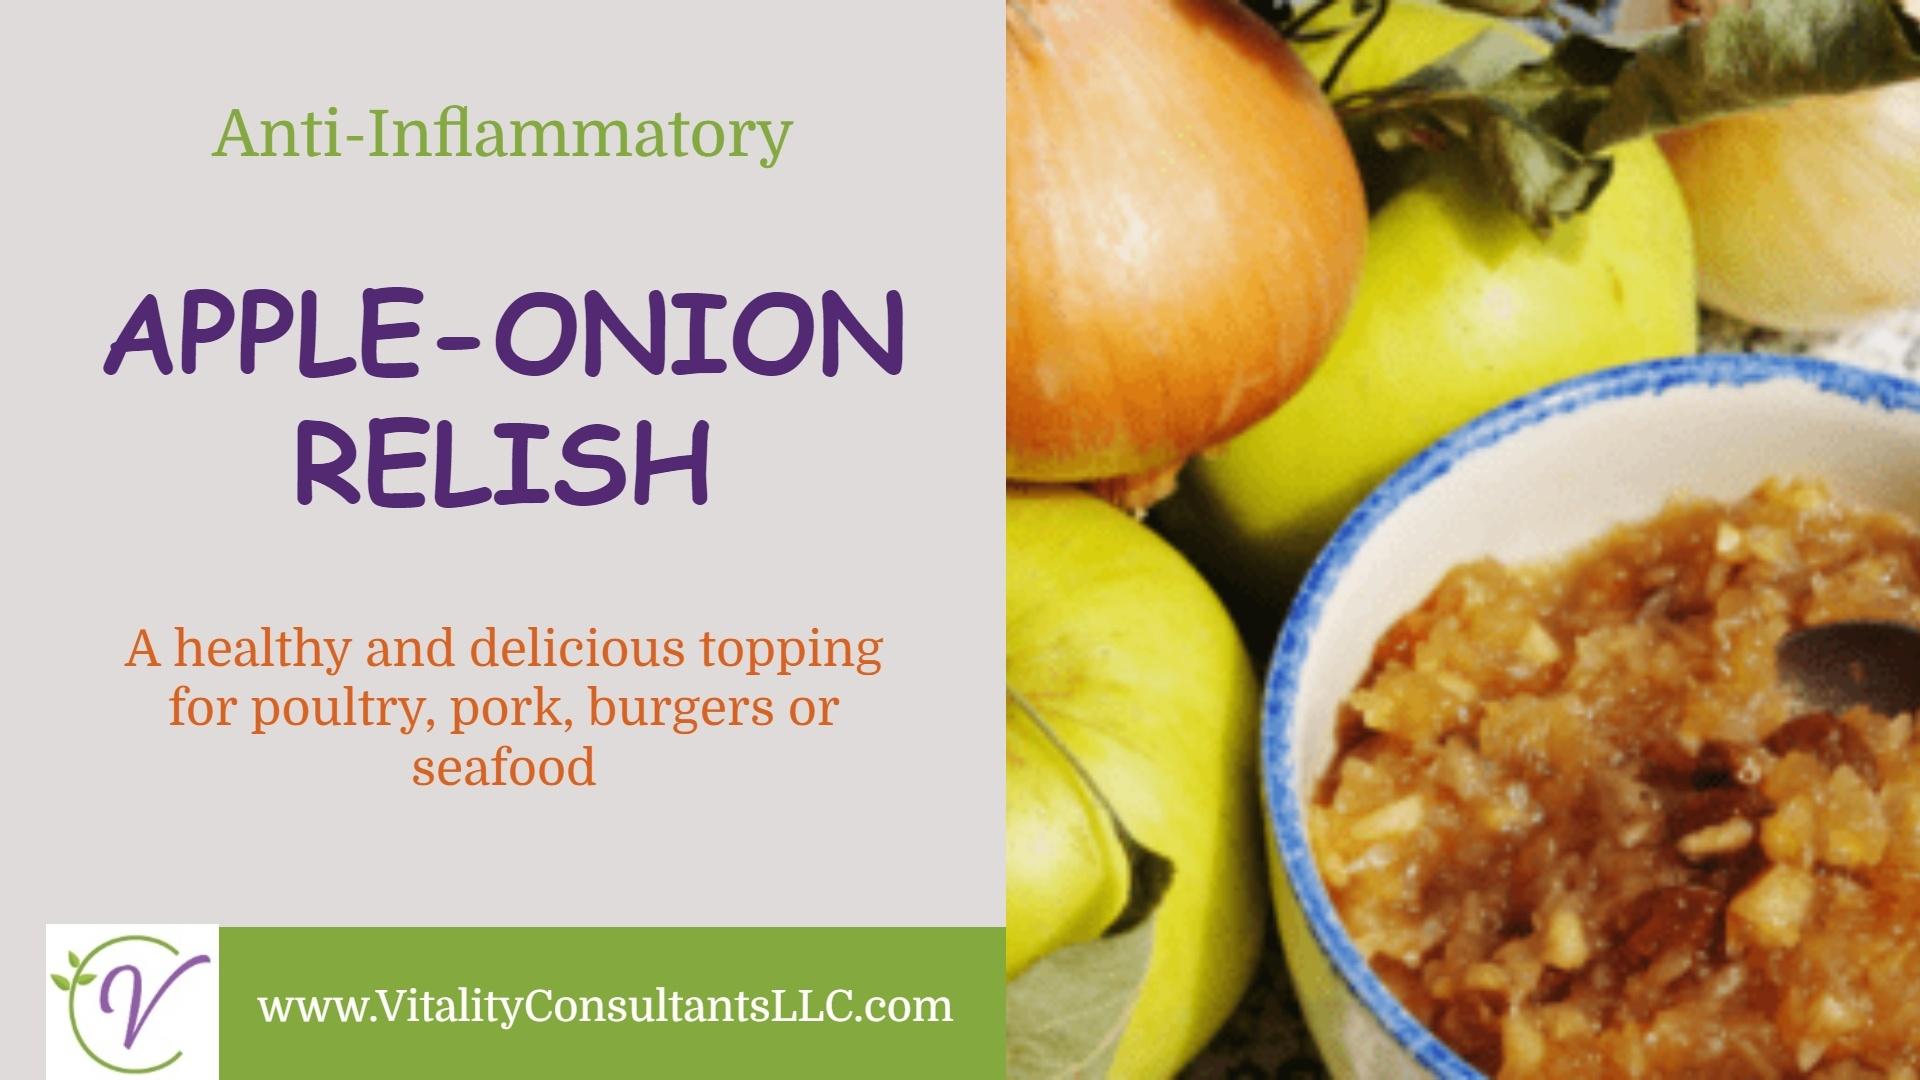 Apple-Onion Relish